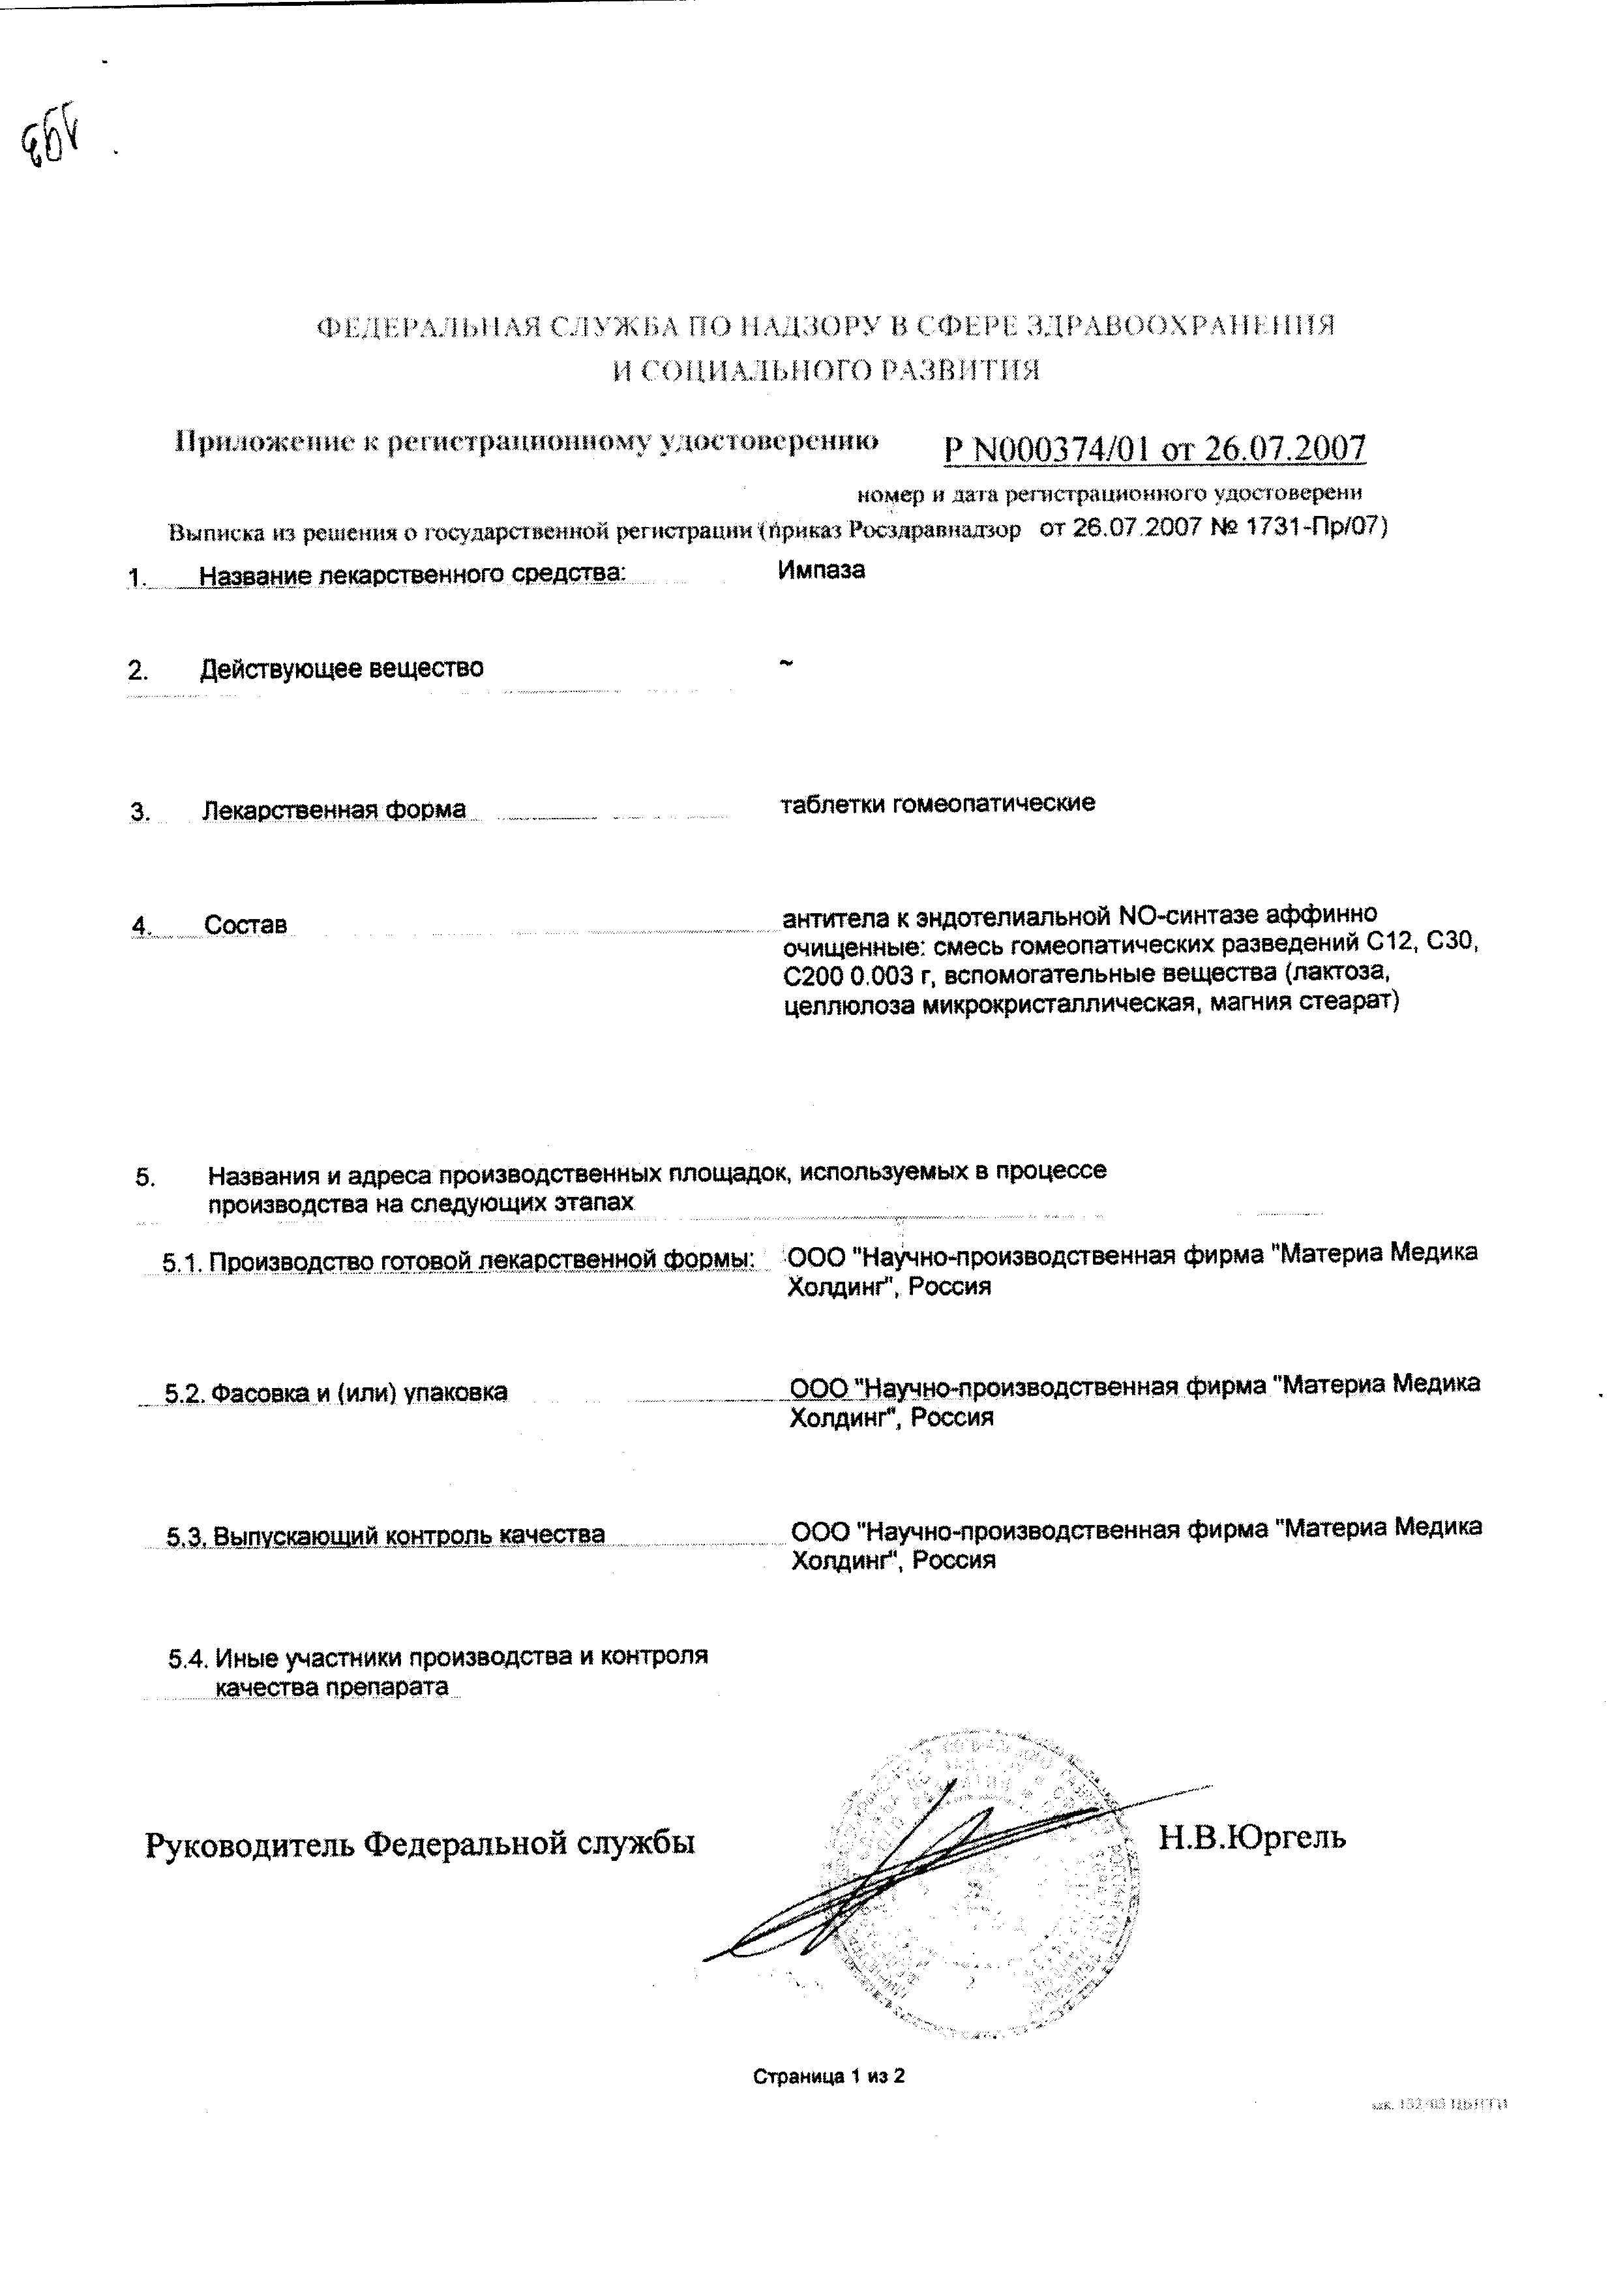 Импаза сертификат